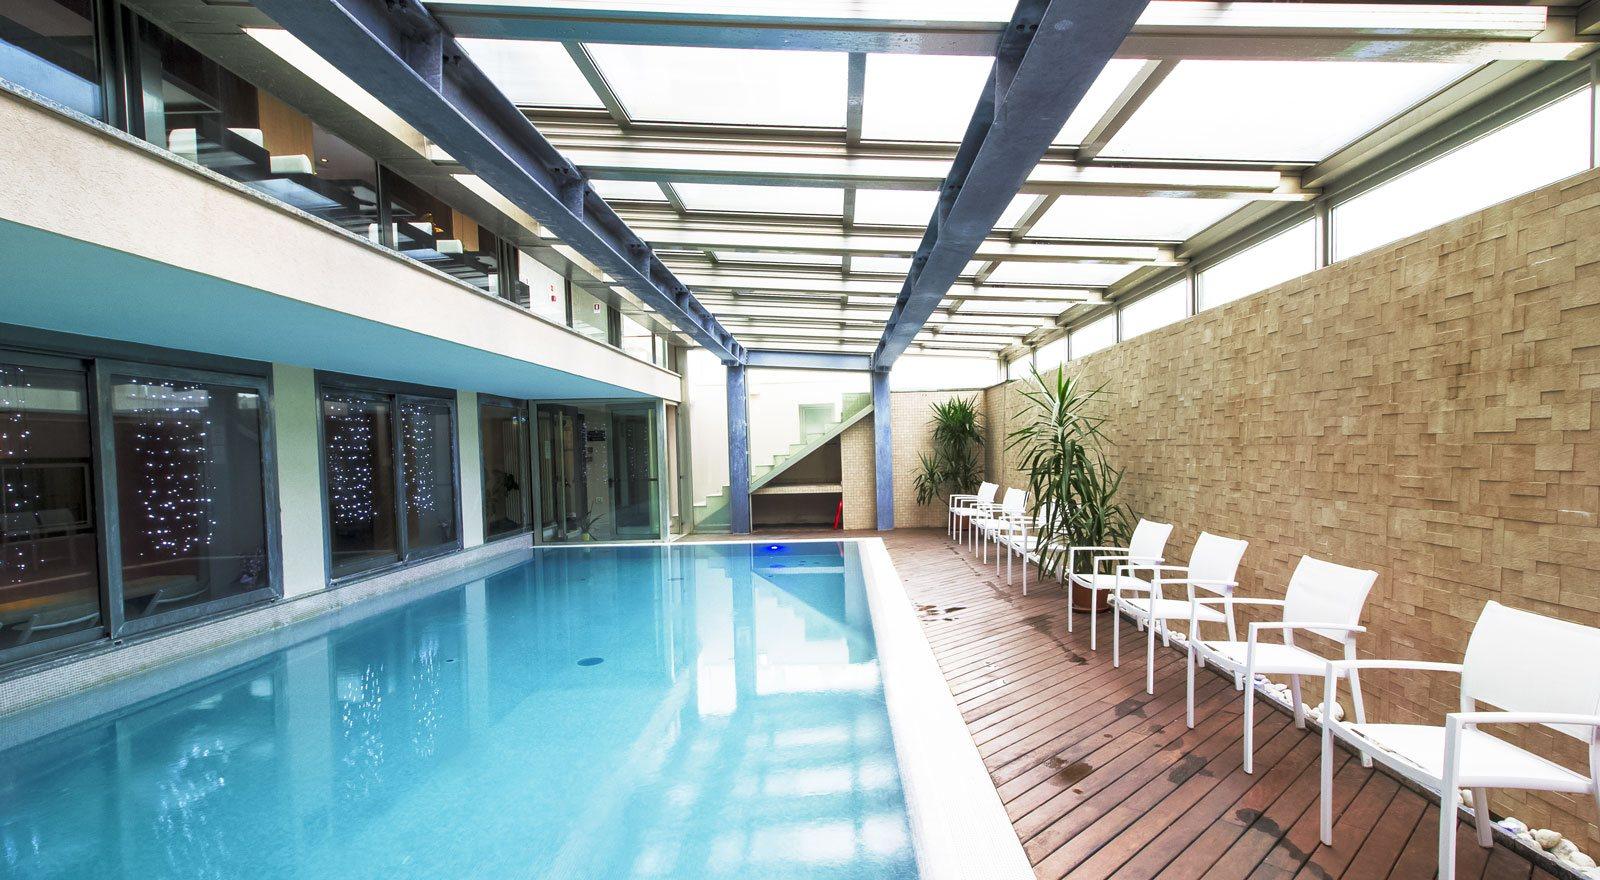 Hotel con piscina riscaldata a rimini terminal palace spa - Hotel con piscina a rimini ...